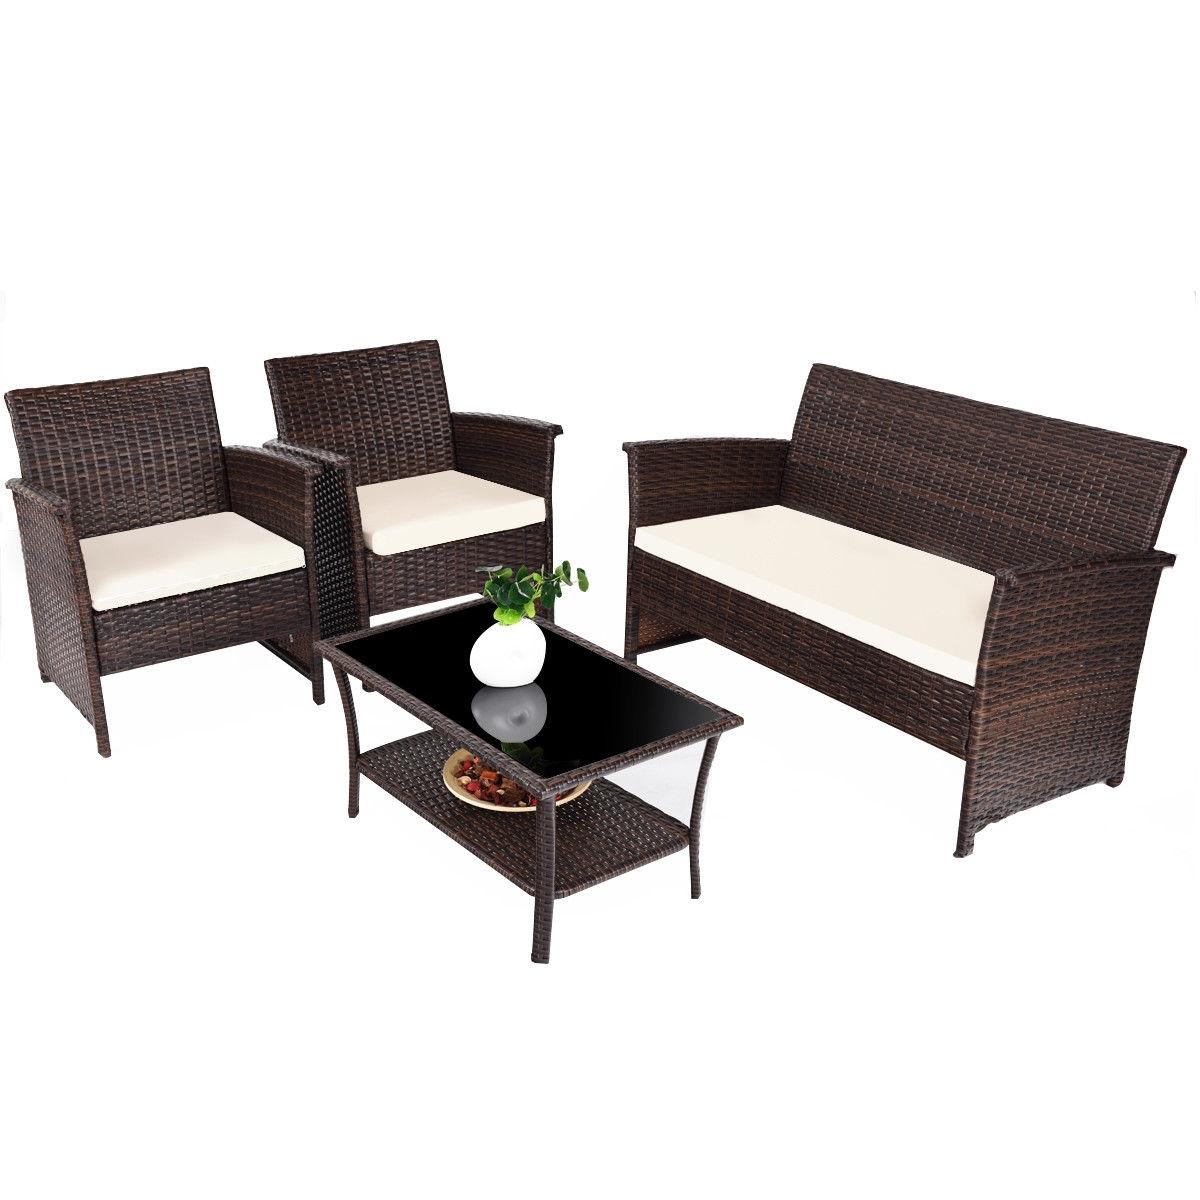 4 pcs Outdoor Patio Rattan Furniture Wicker Sofa Set